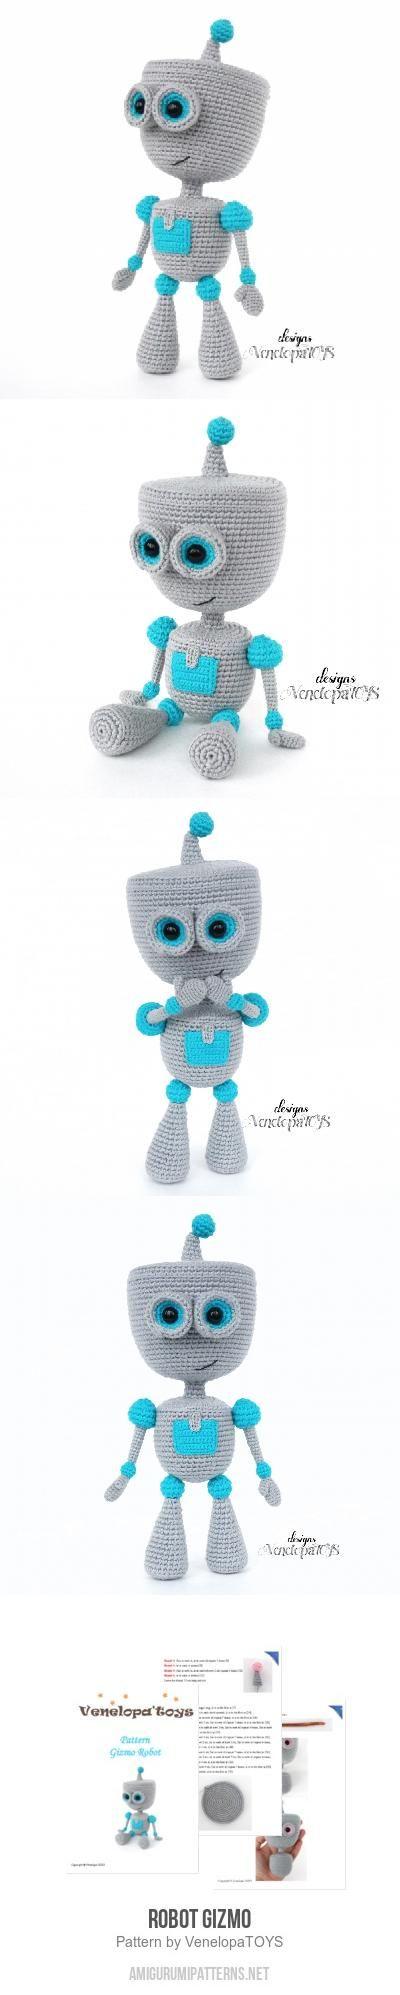 Robot Gizmo amigurumi pattern